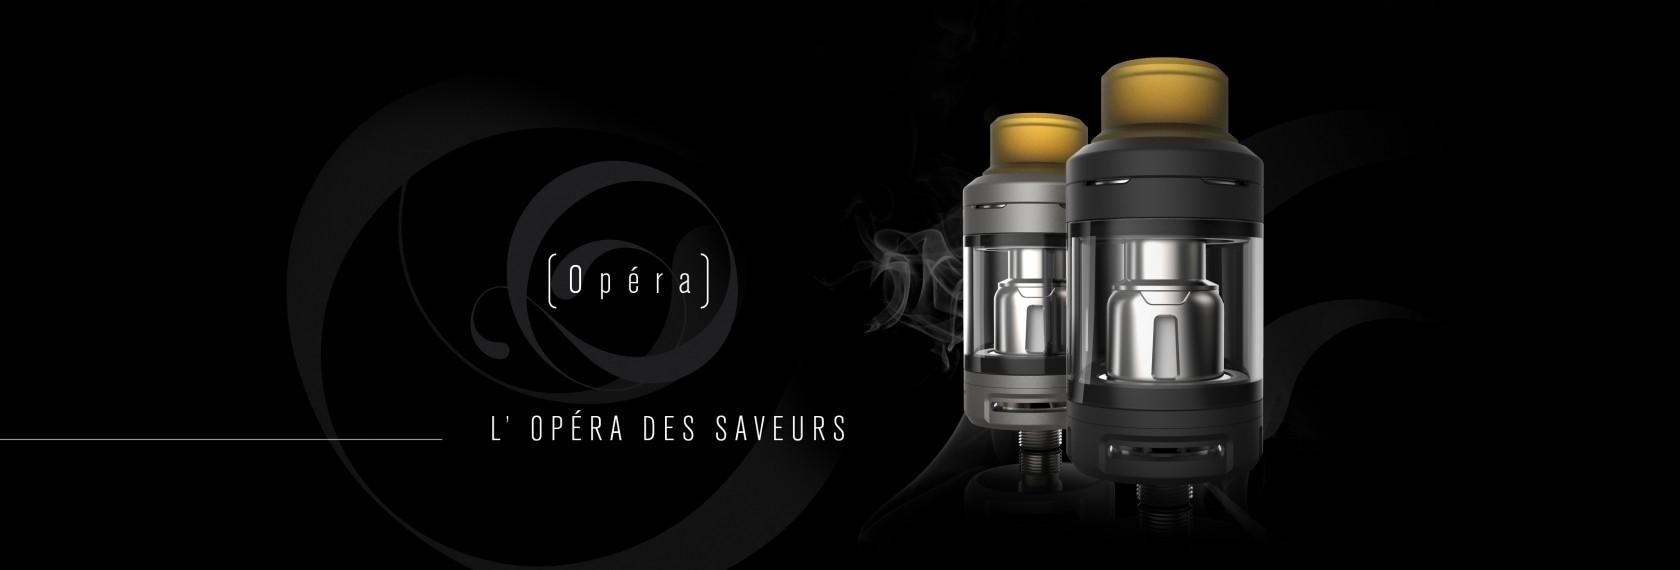 OPERA, L'opéra des saveurs